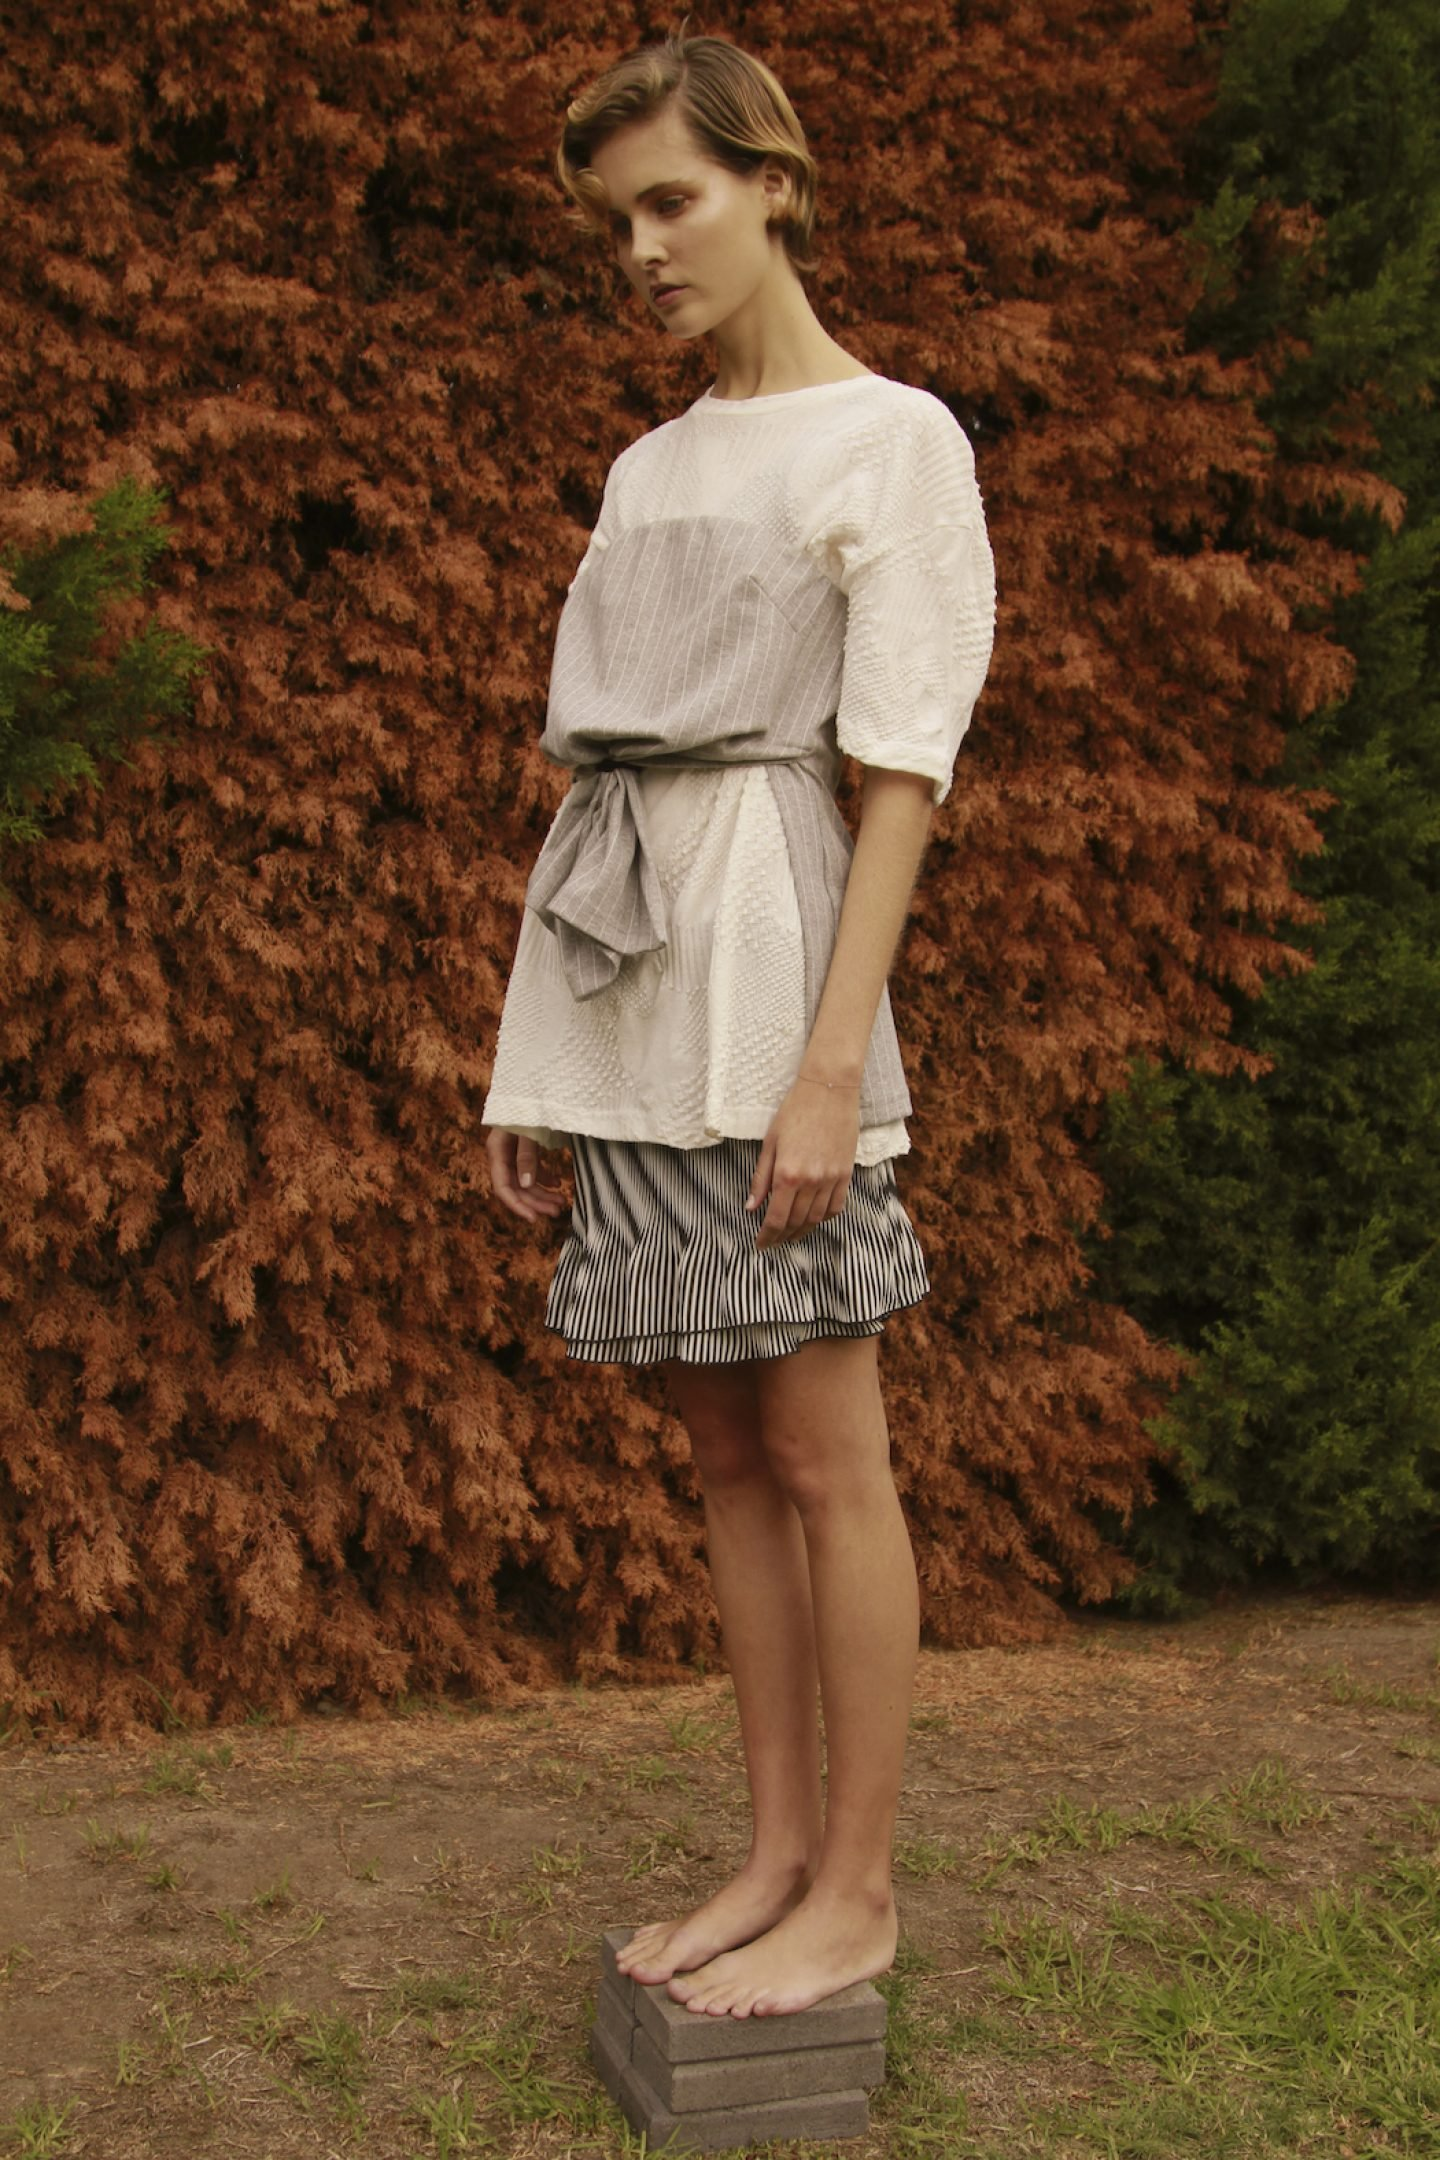 neverland_fashion_006